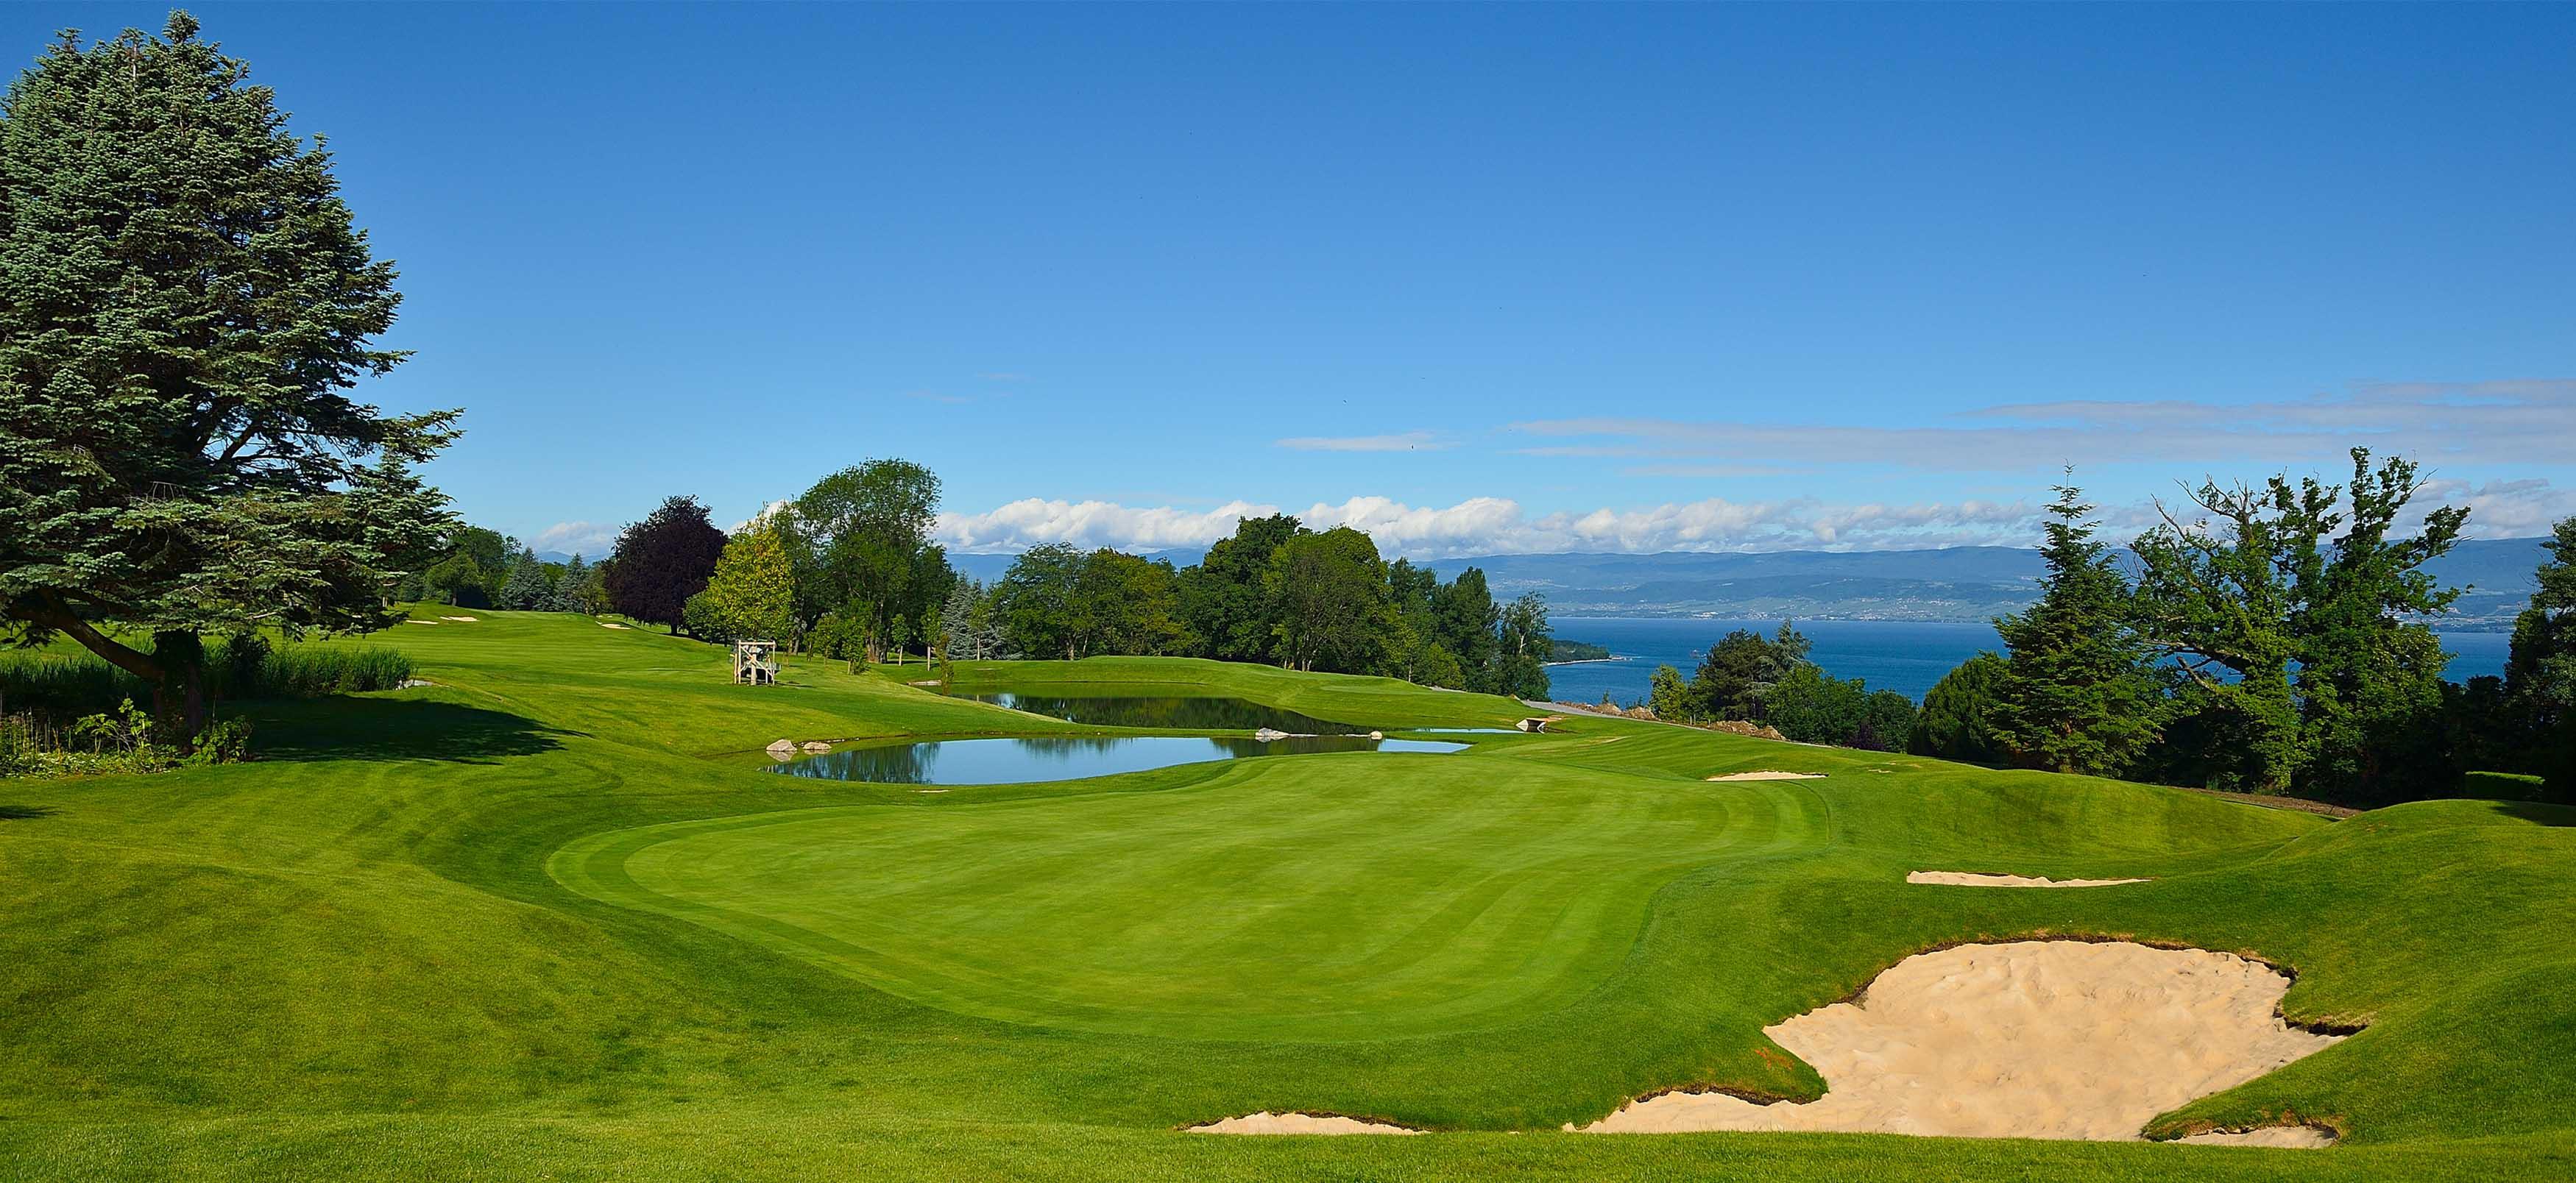 Golf La Prairie >> Golf Course - Breaks, Holidays - 5-star Hotel ROYAL Evian (France, Europe)